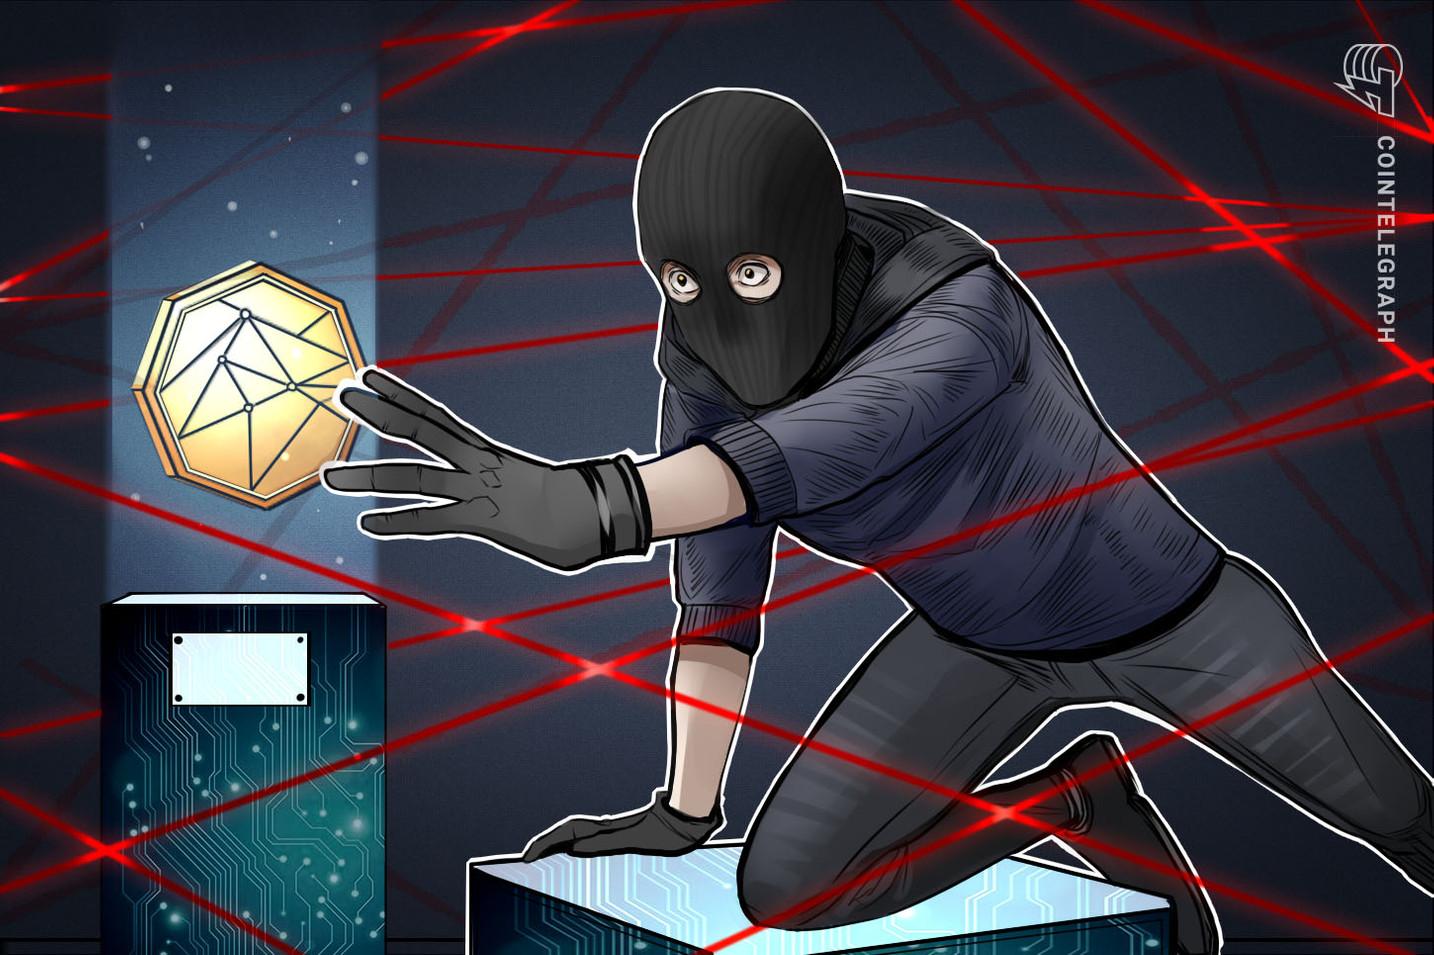 Singapur: Hakovana je kripto berza DragonEx